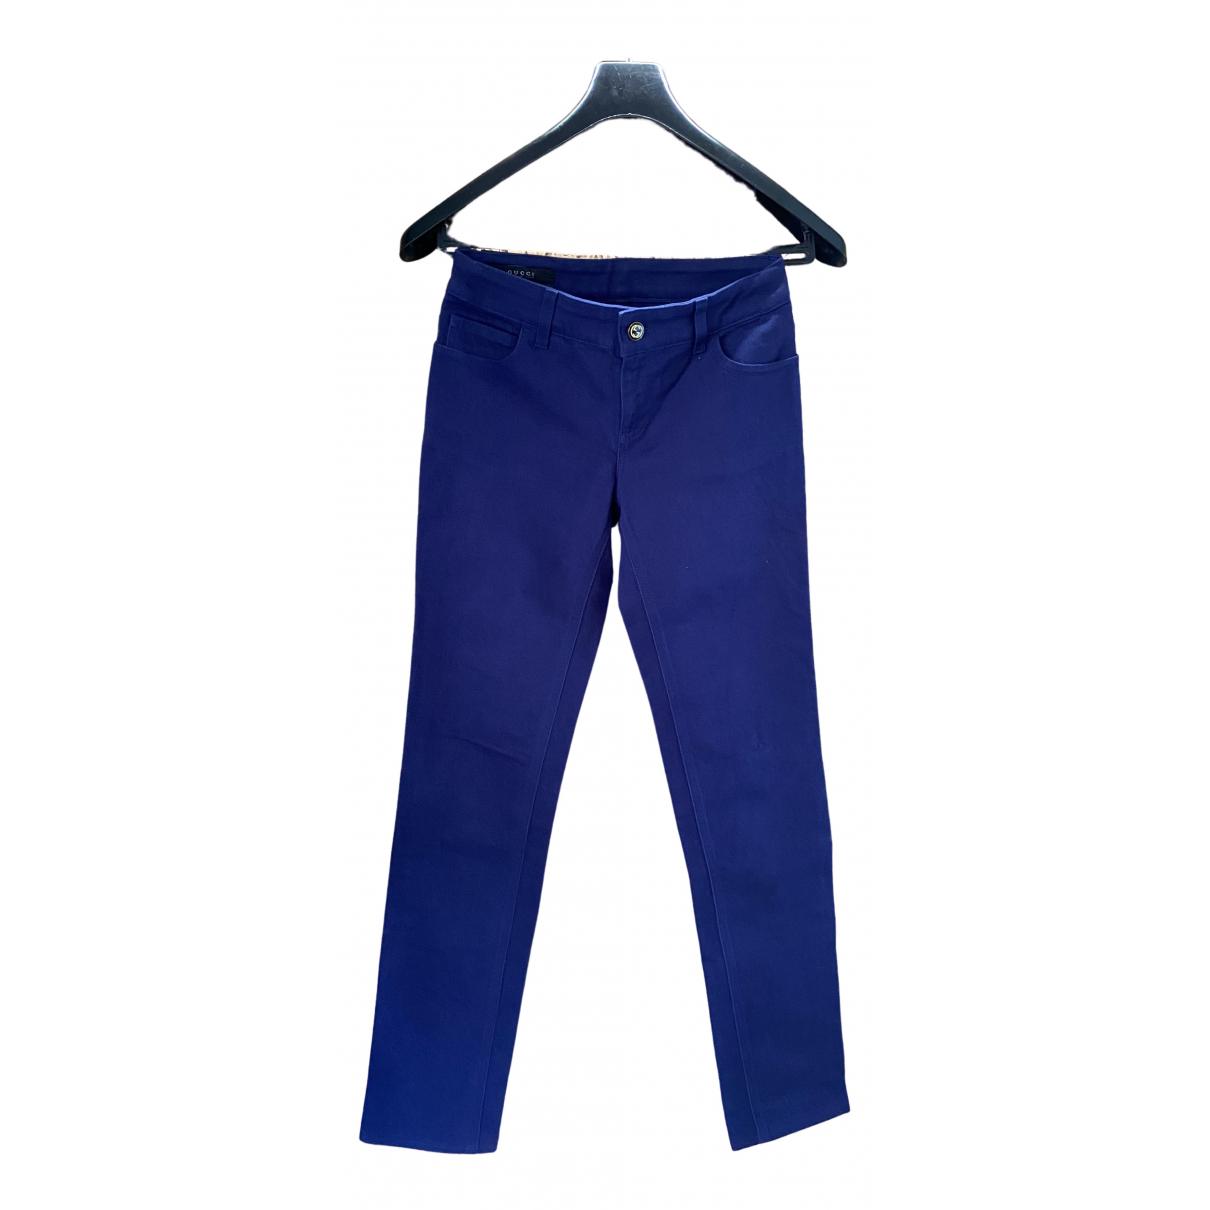 Gucci \N Blue Cotton - elasthane Jeans for Women 40 FR